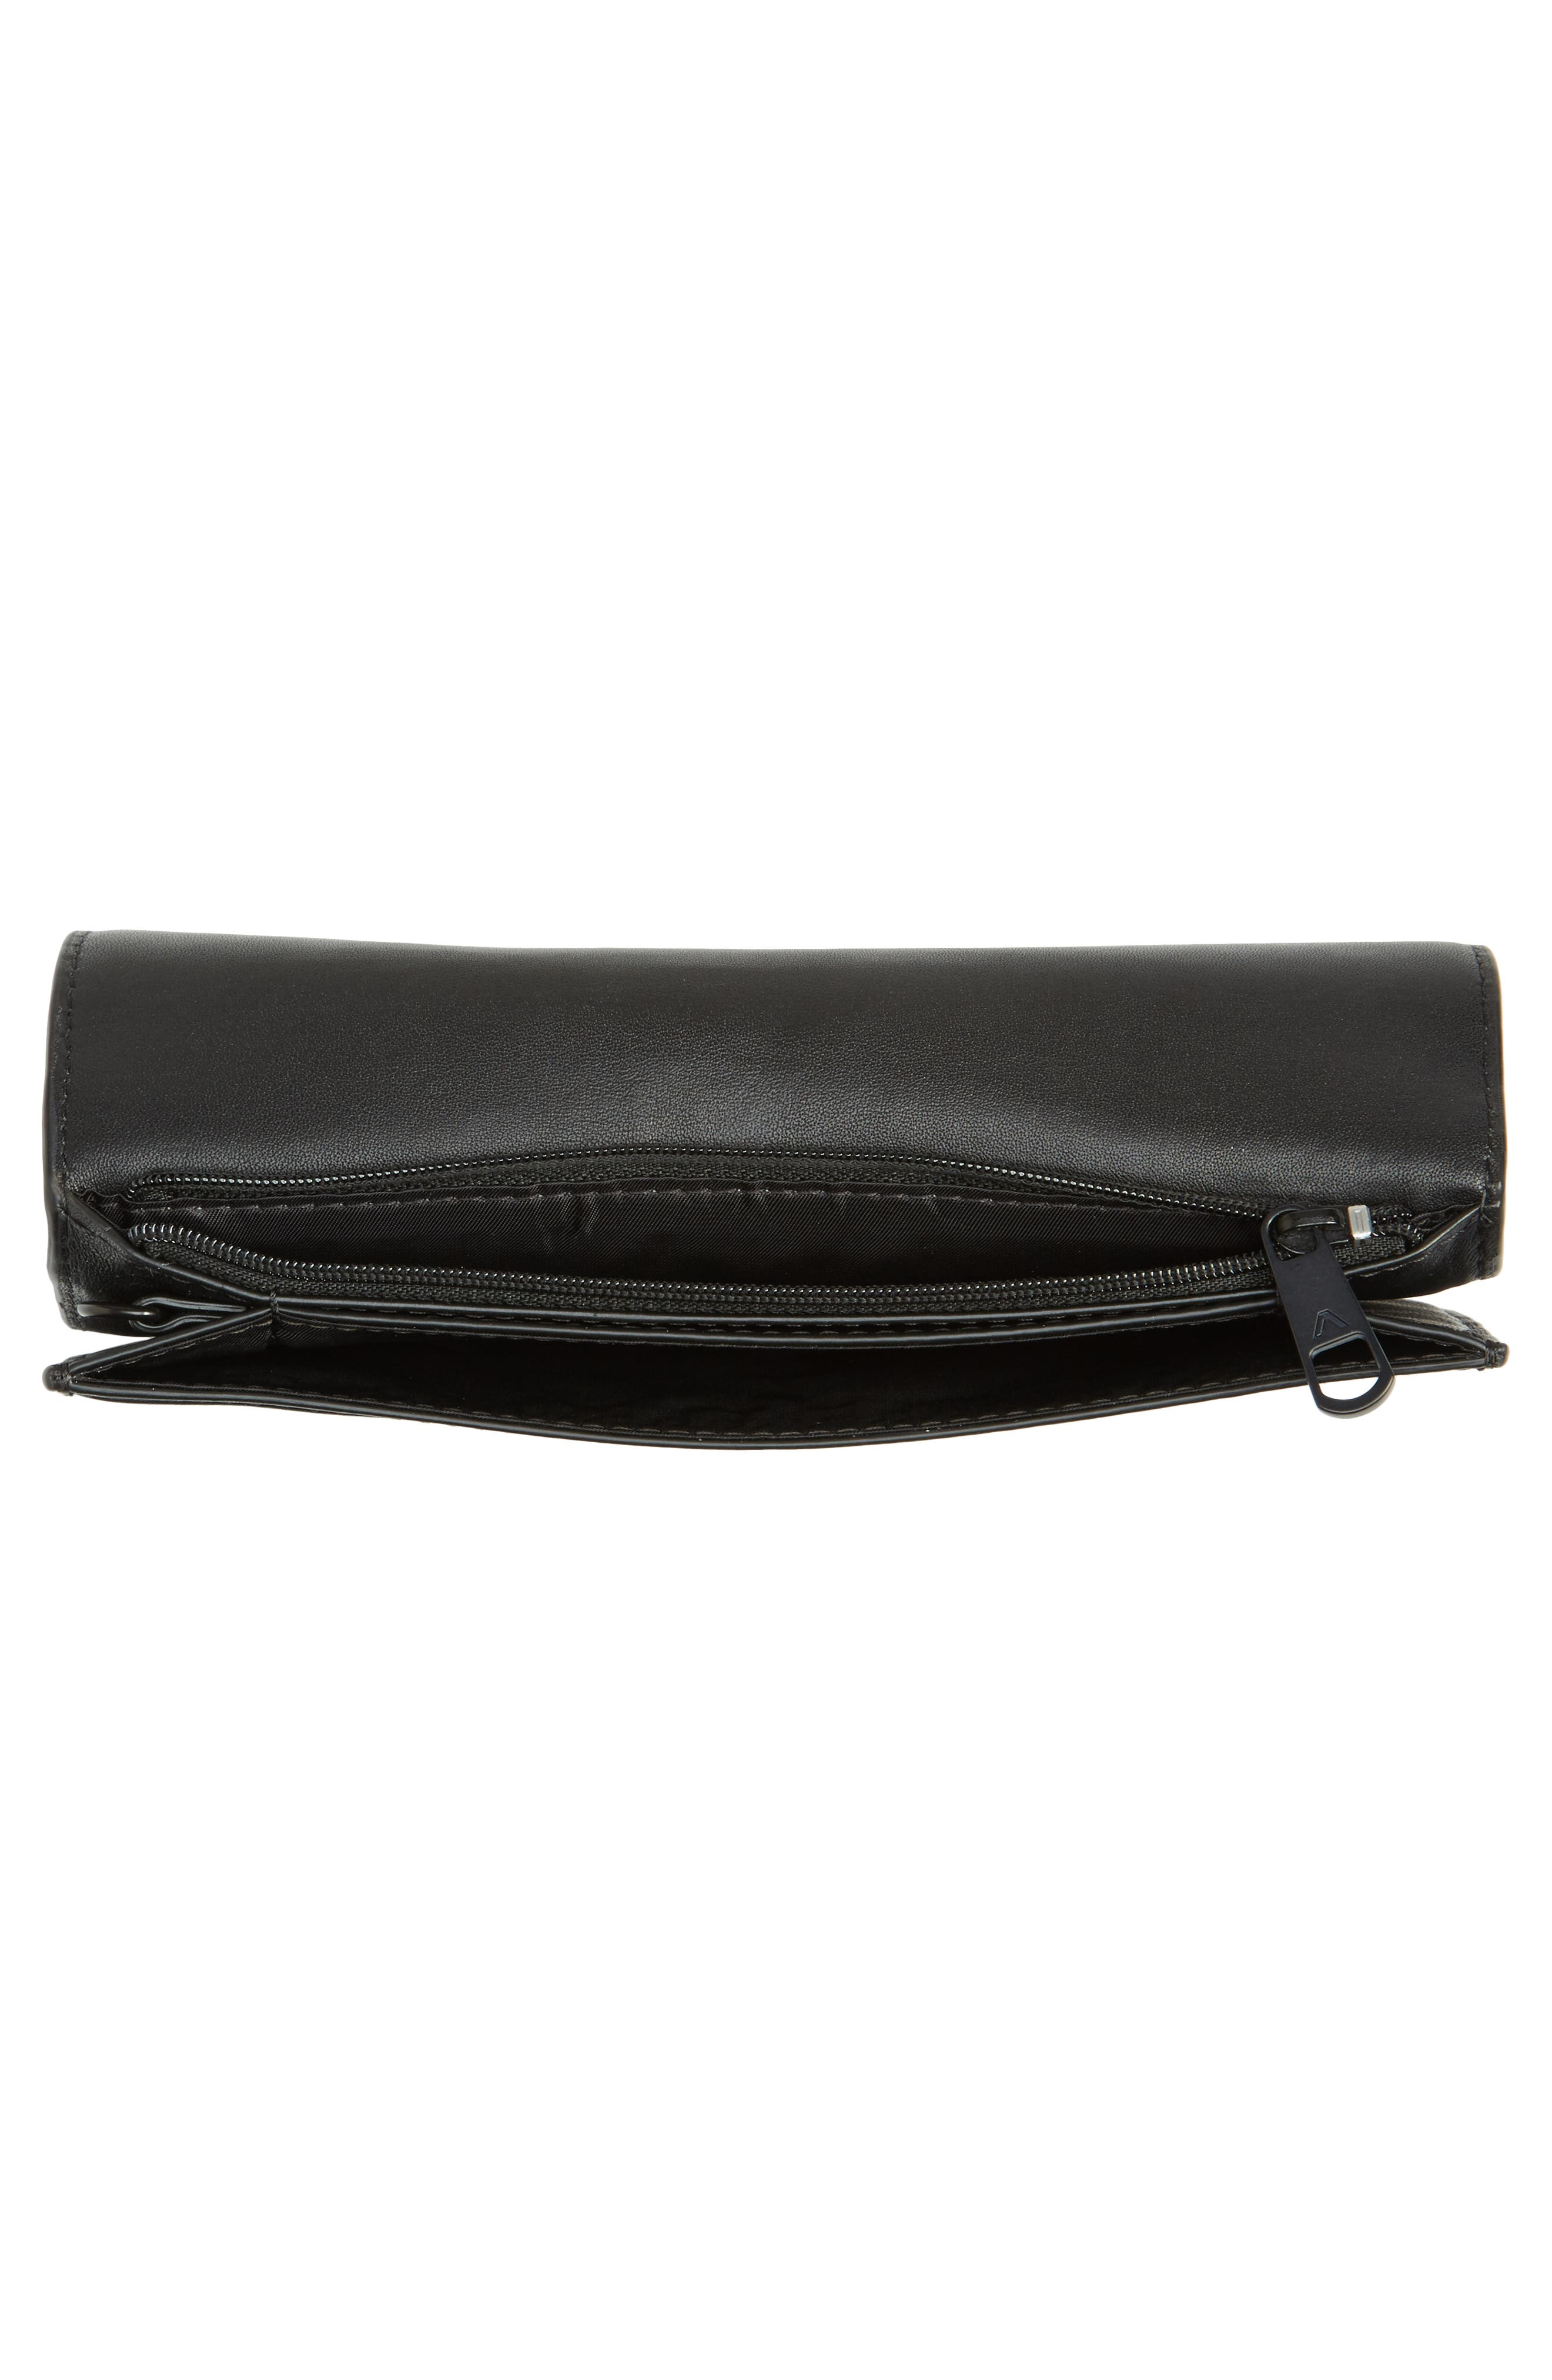 Alternate Image 2  - STATE Bags Parkville Bristol Leather Wristlet